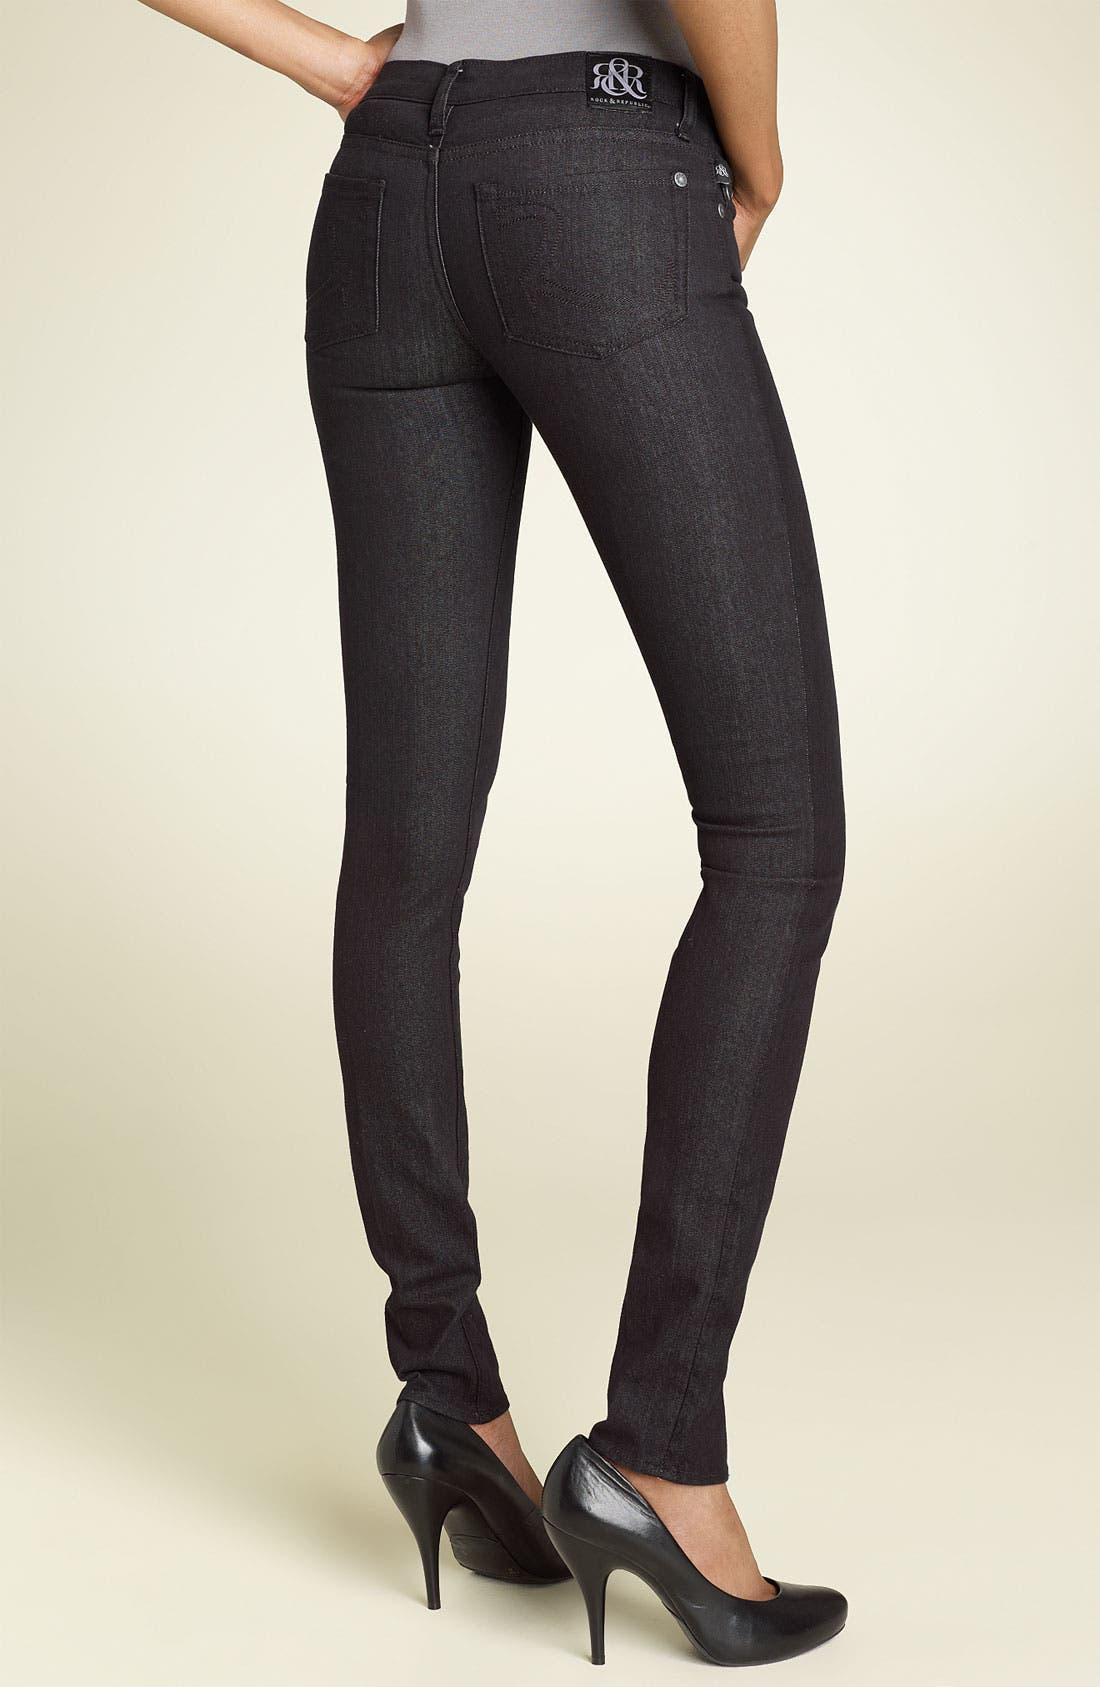 Alternate Image 1 Selected - Rock & Republic 'Berlin' Skinny Stretch Jeans (Black Wash)